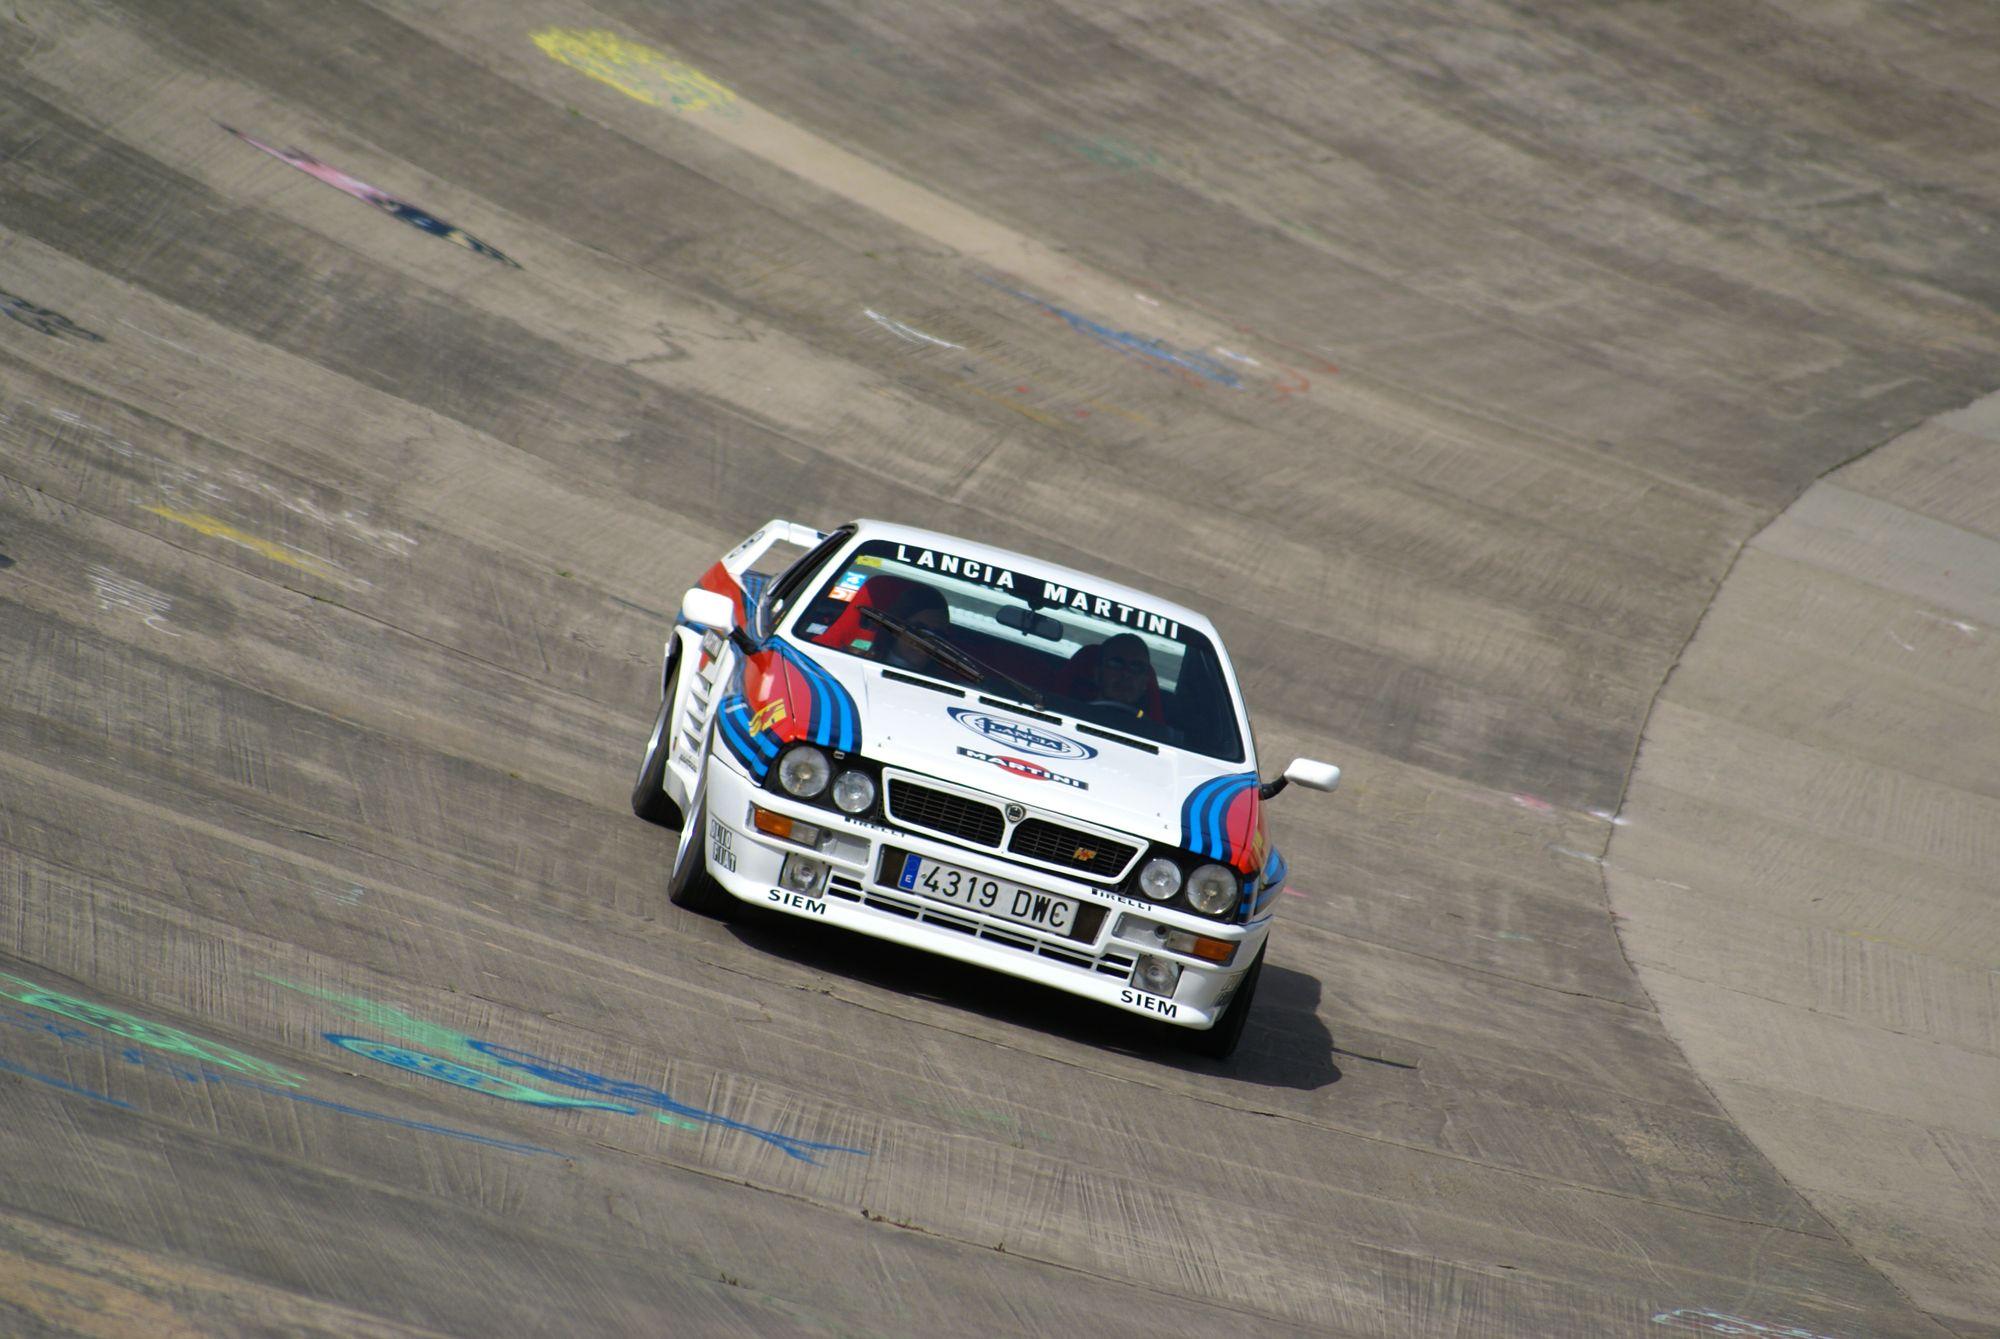 Circuito Terramar : El autodromo de terramar sitges españa autòdrom terramar